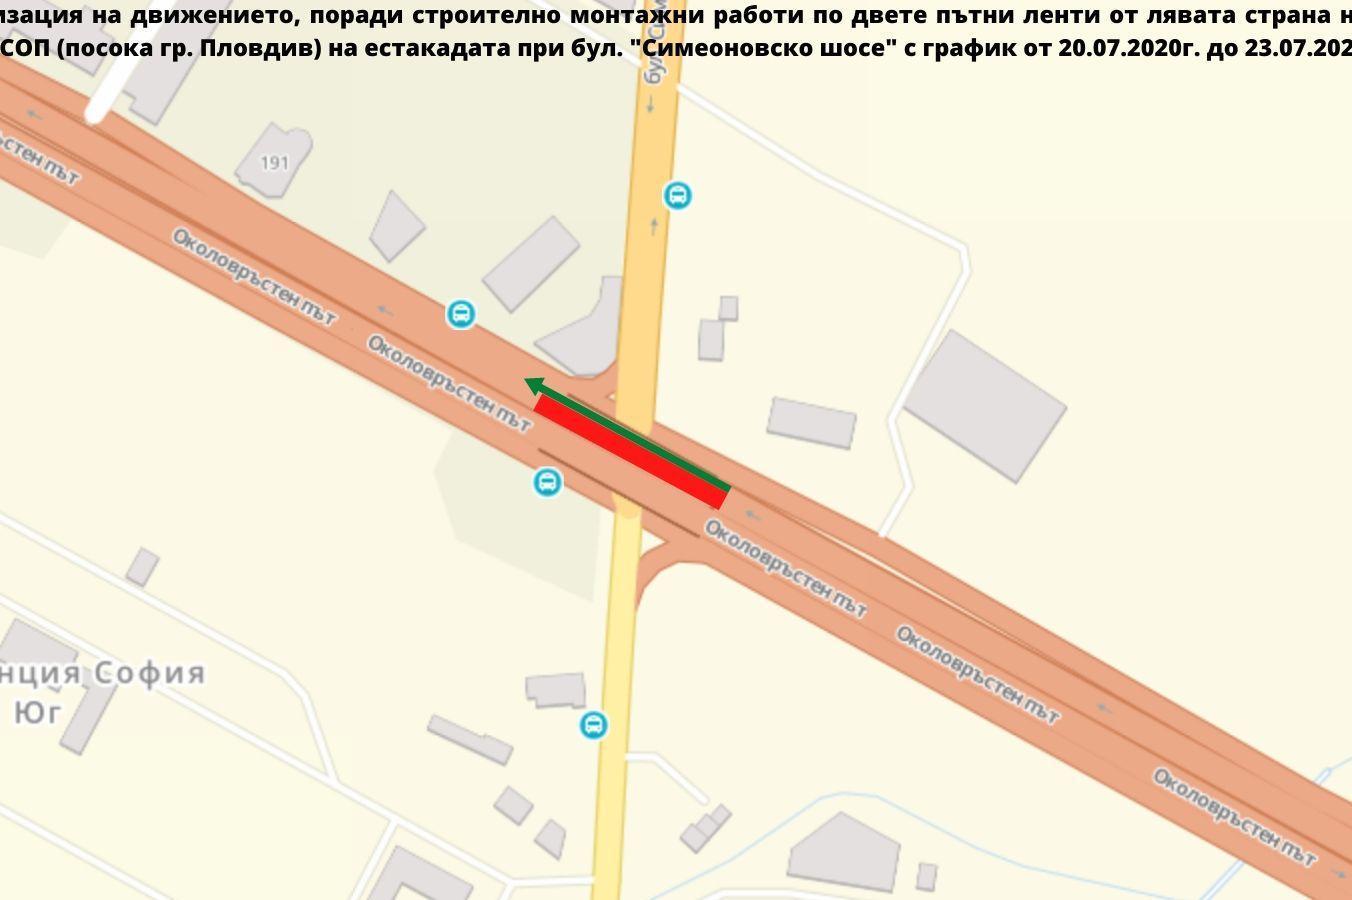 Затварят на етапи движението по Бистришко шосе, ремонтират естакадата